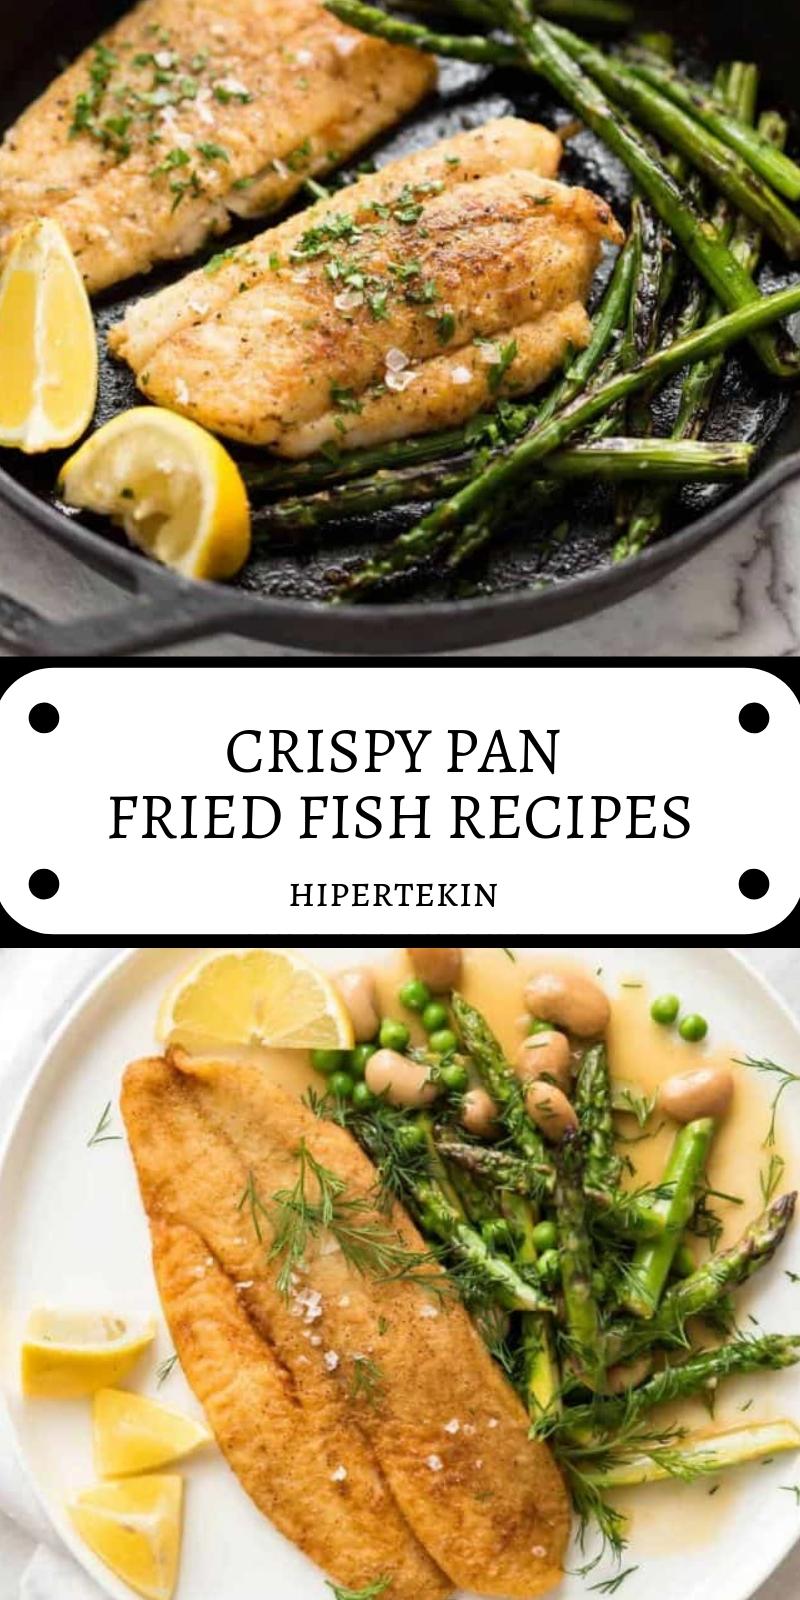 CRISPY PAN FRIED FISH RECIPES